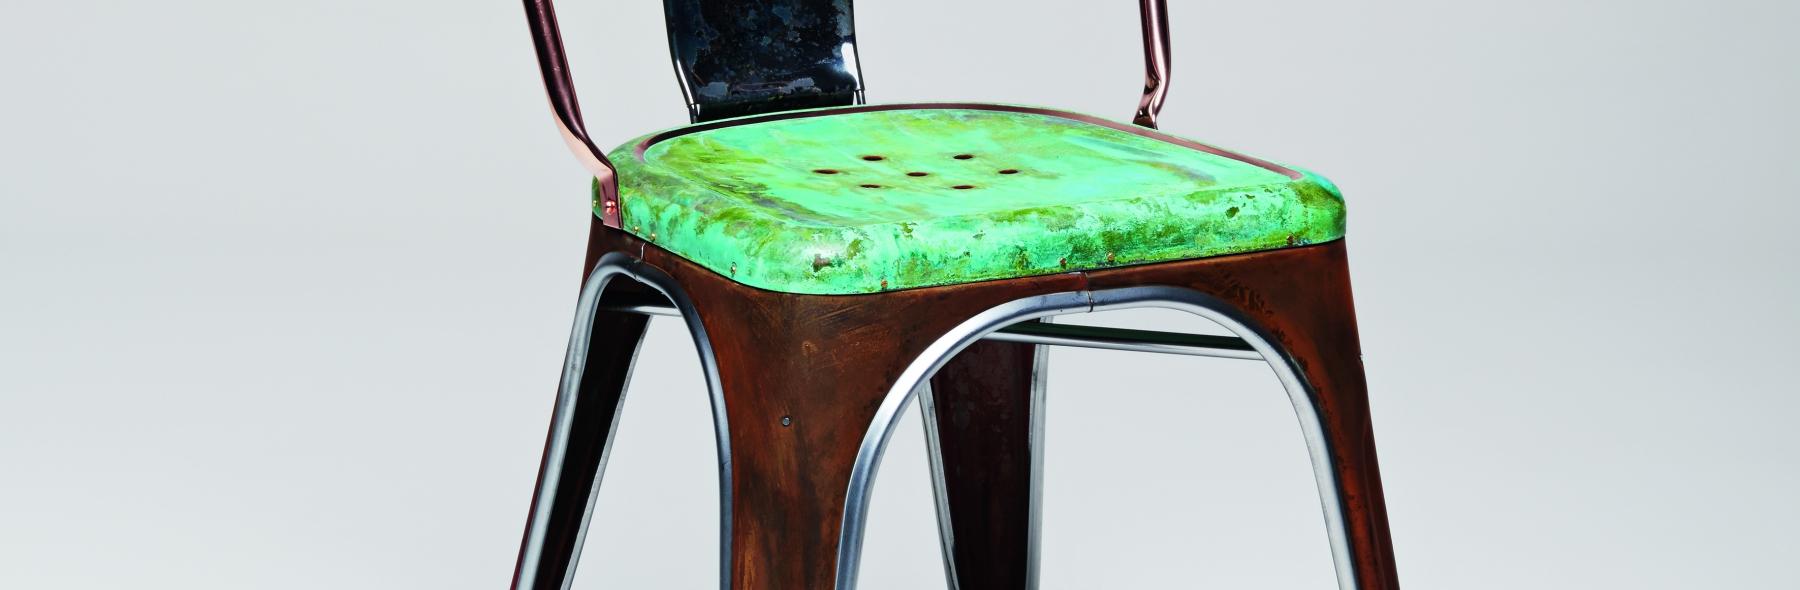 detalle silla vintage tolix mallorca